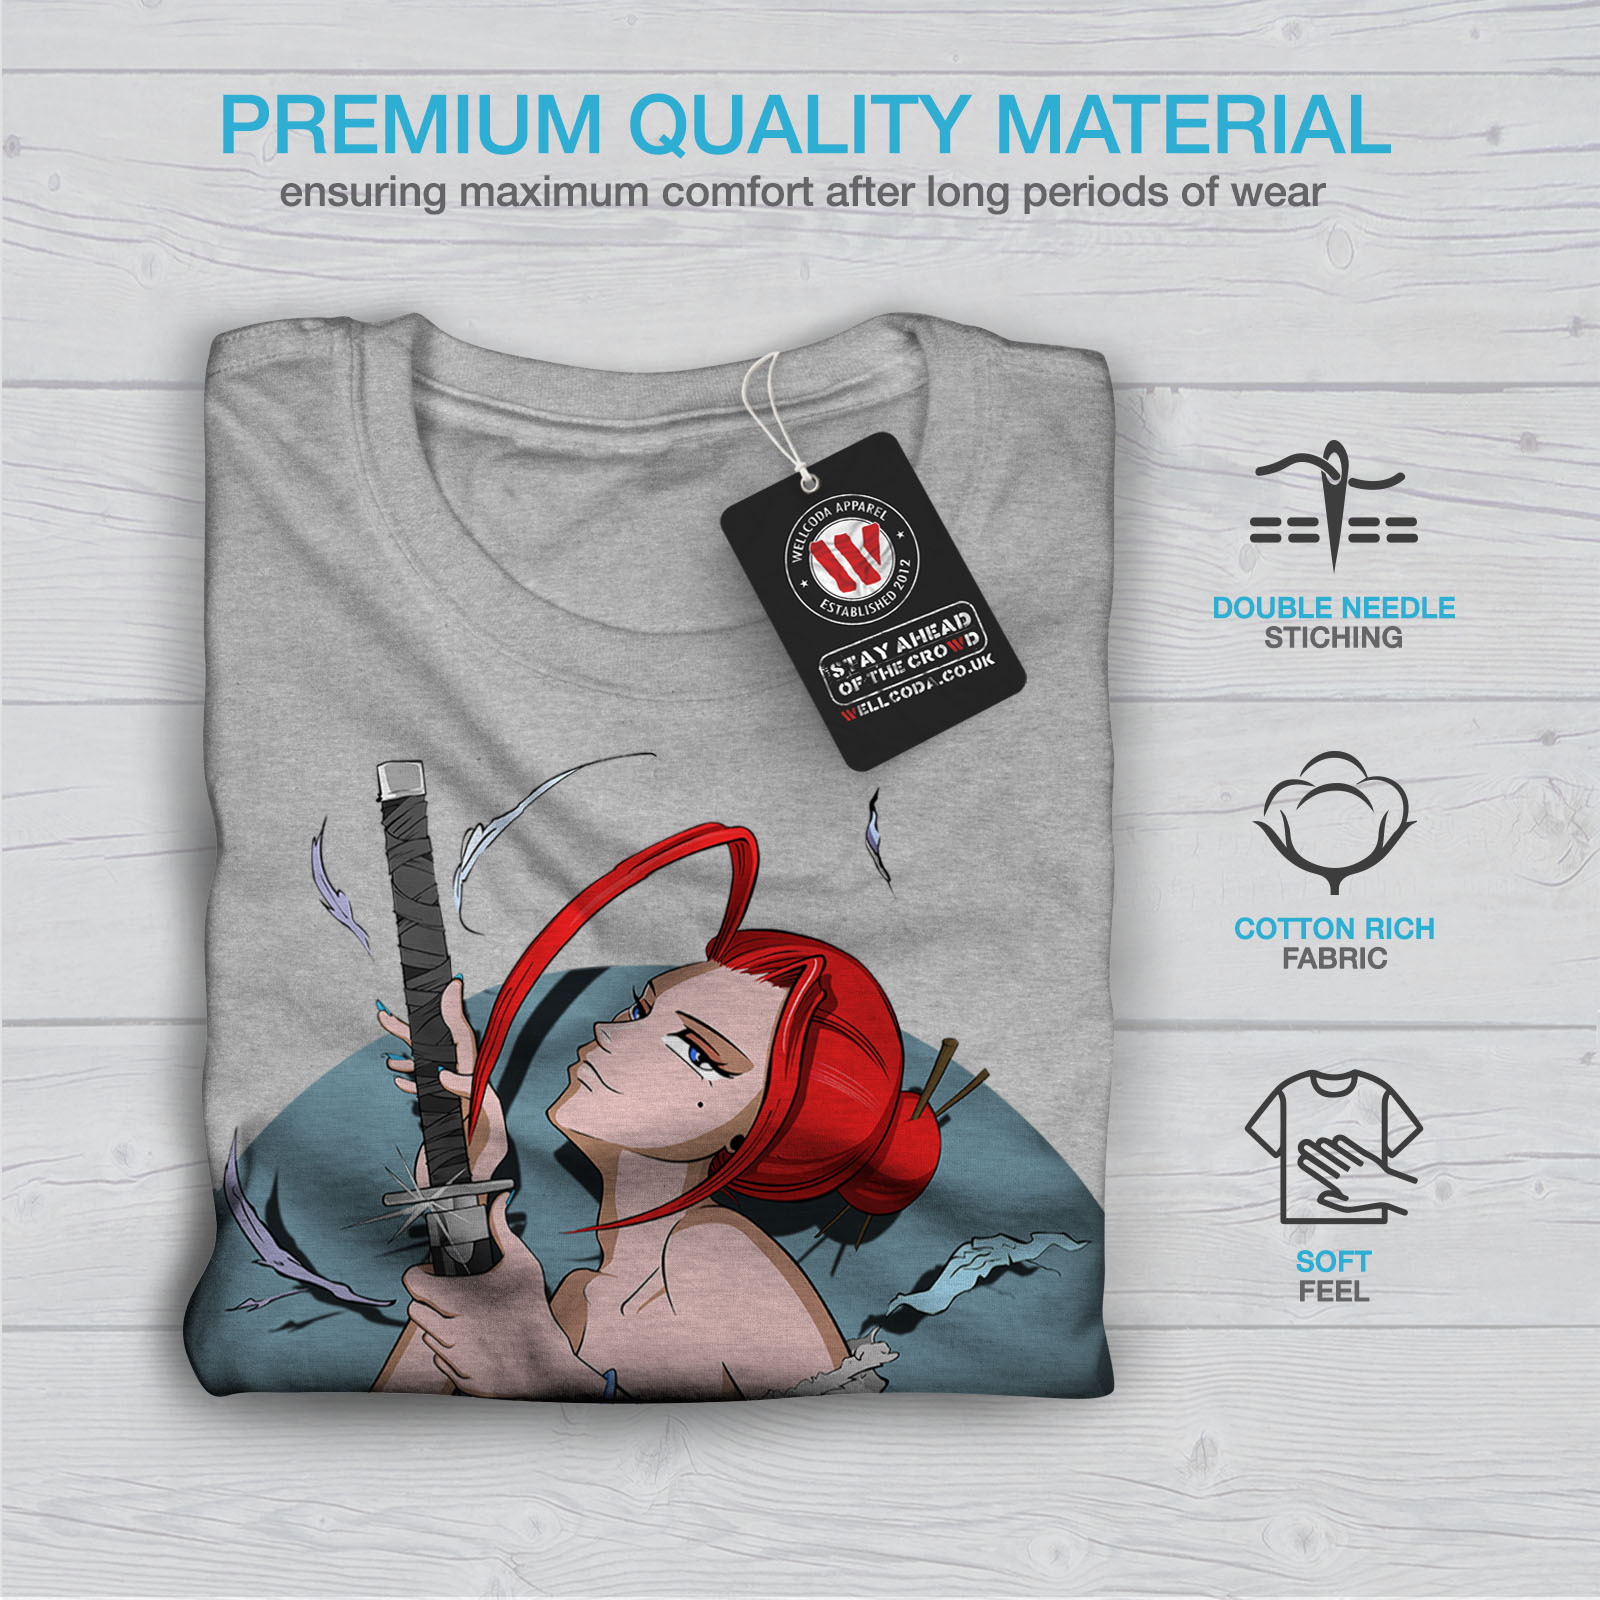 Wellcoda-Anime-Katana-Girl-Mens-T-shirt-Japanese-Graphic-Design-Printed-Tee thumbnail 19